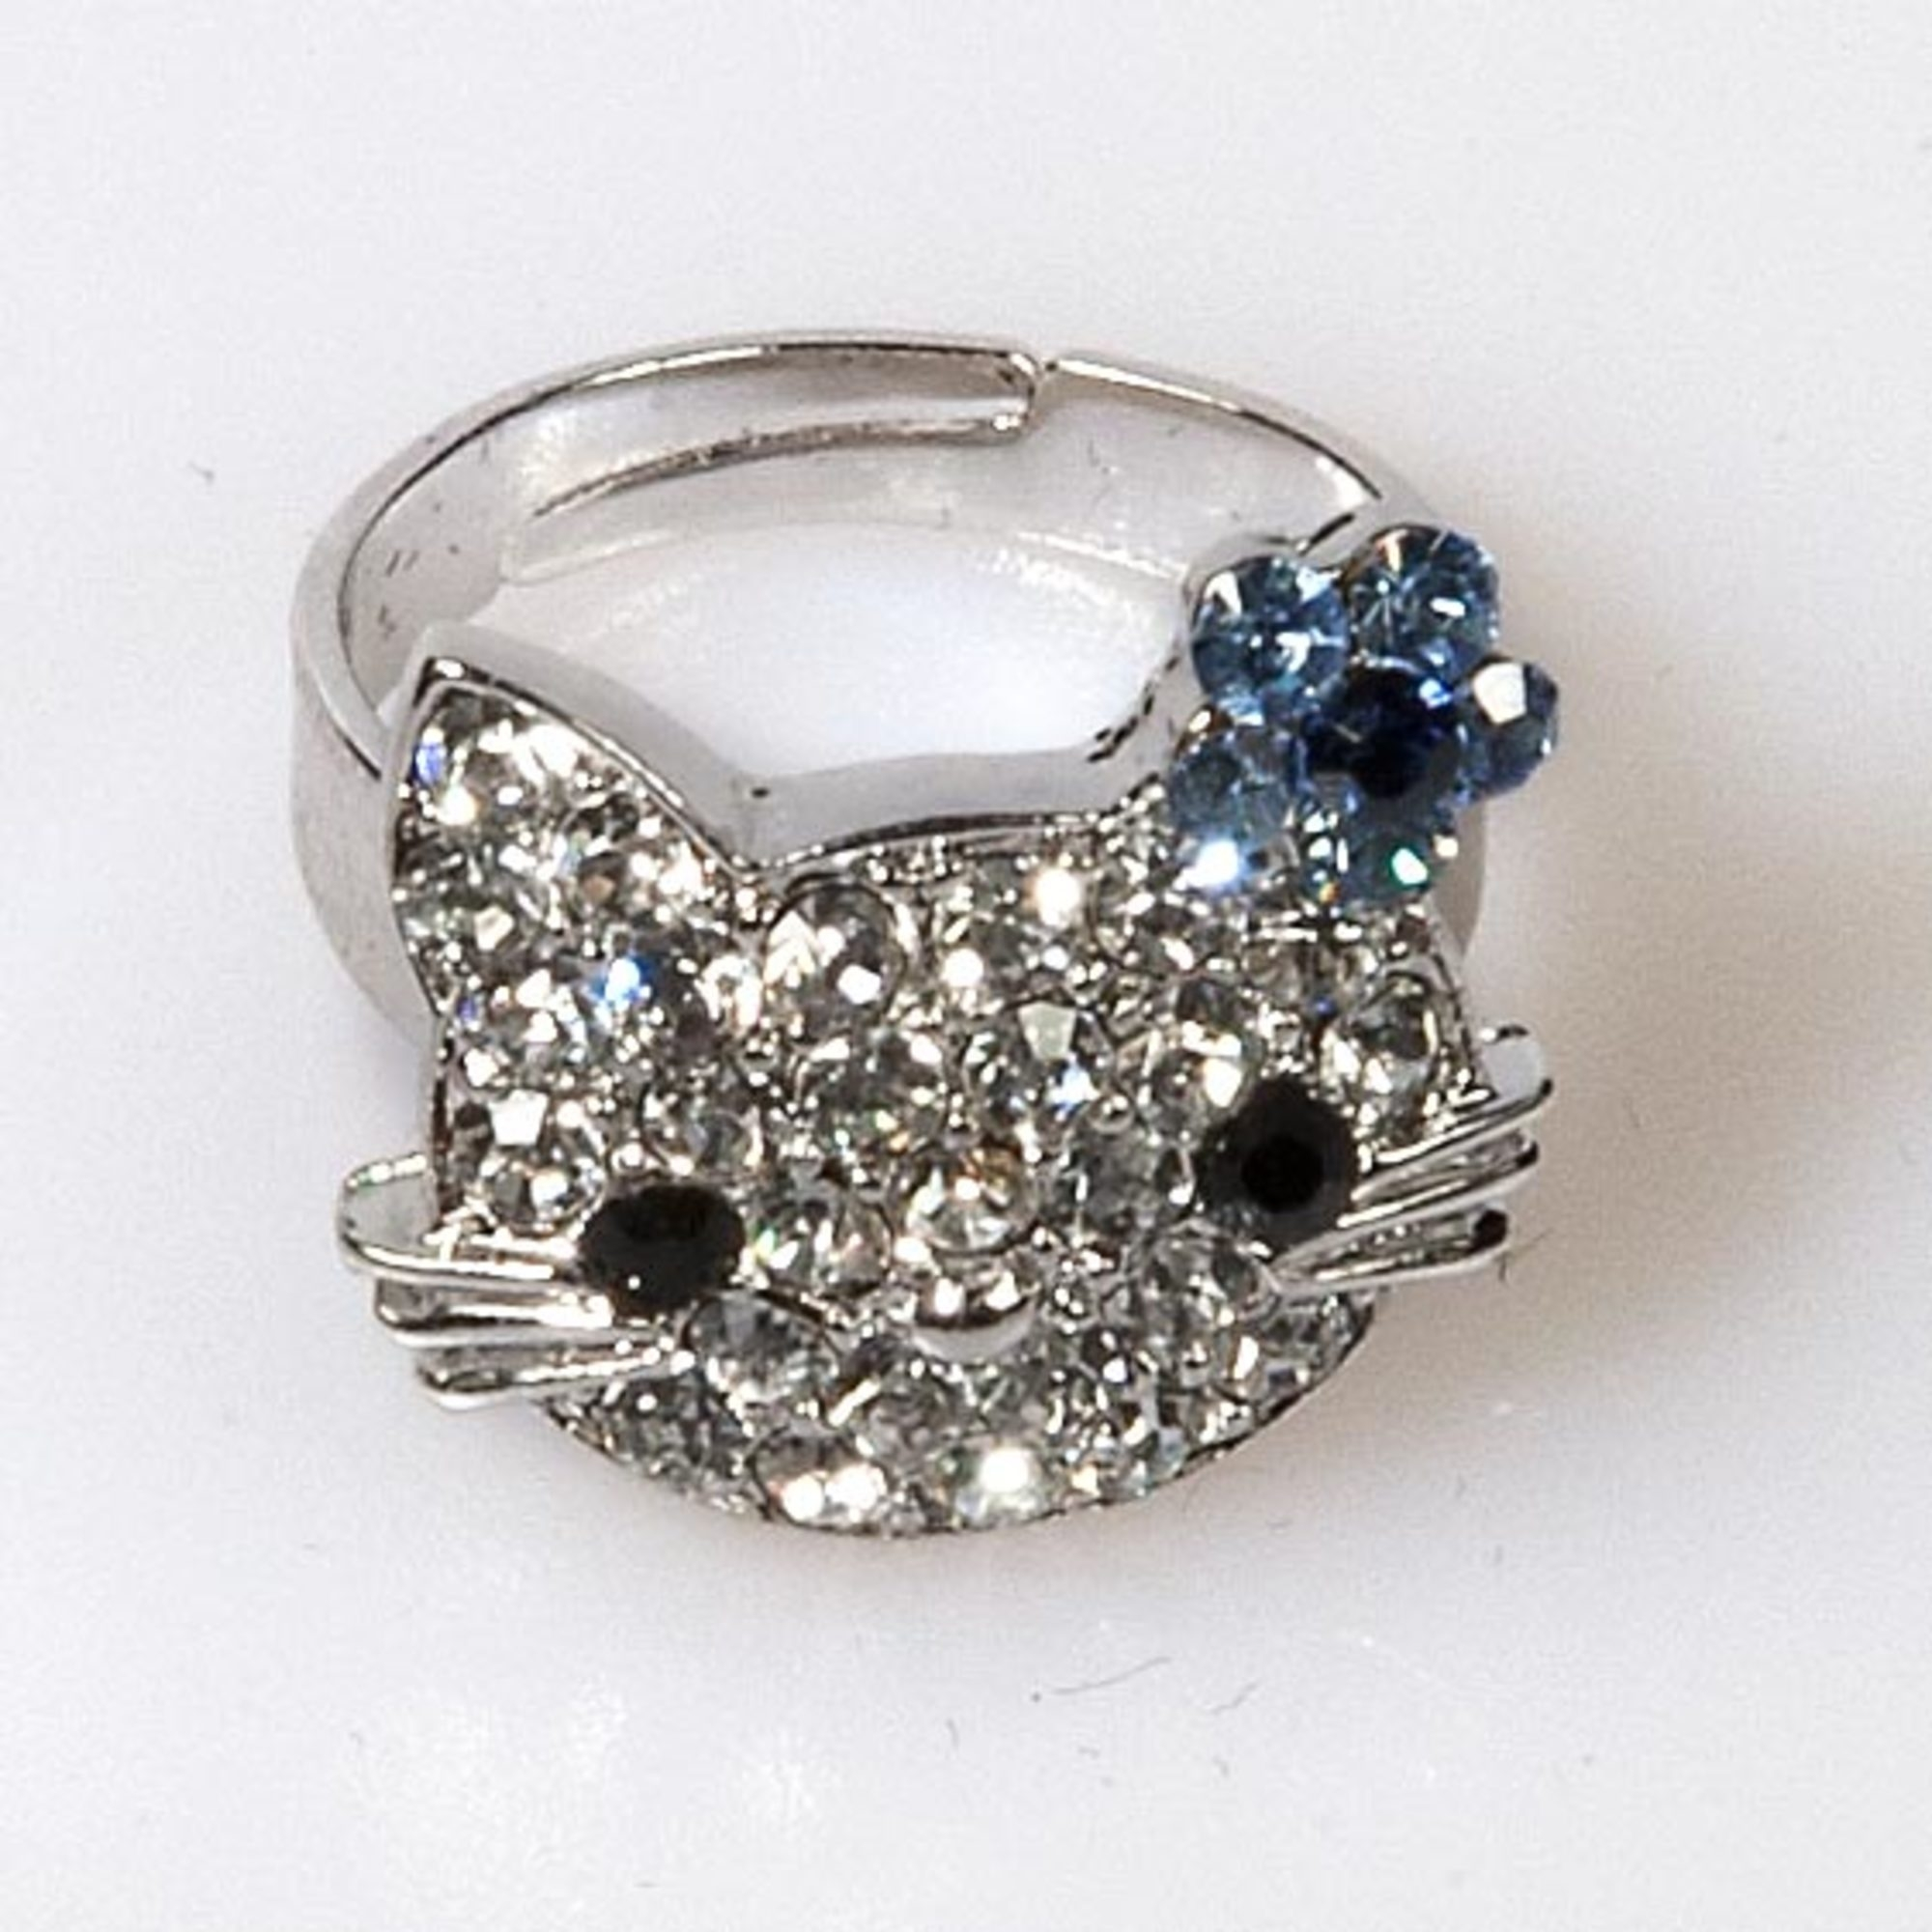 Kitty Flower Ring - Light Sapphire